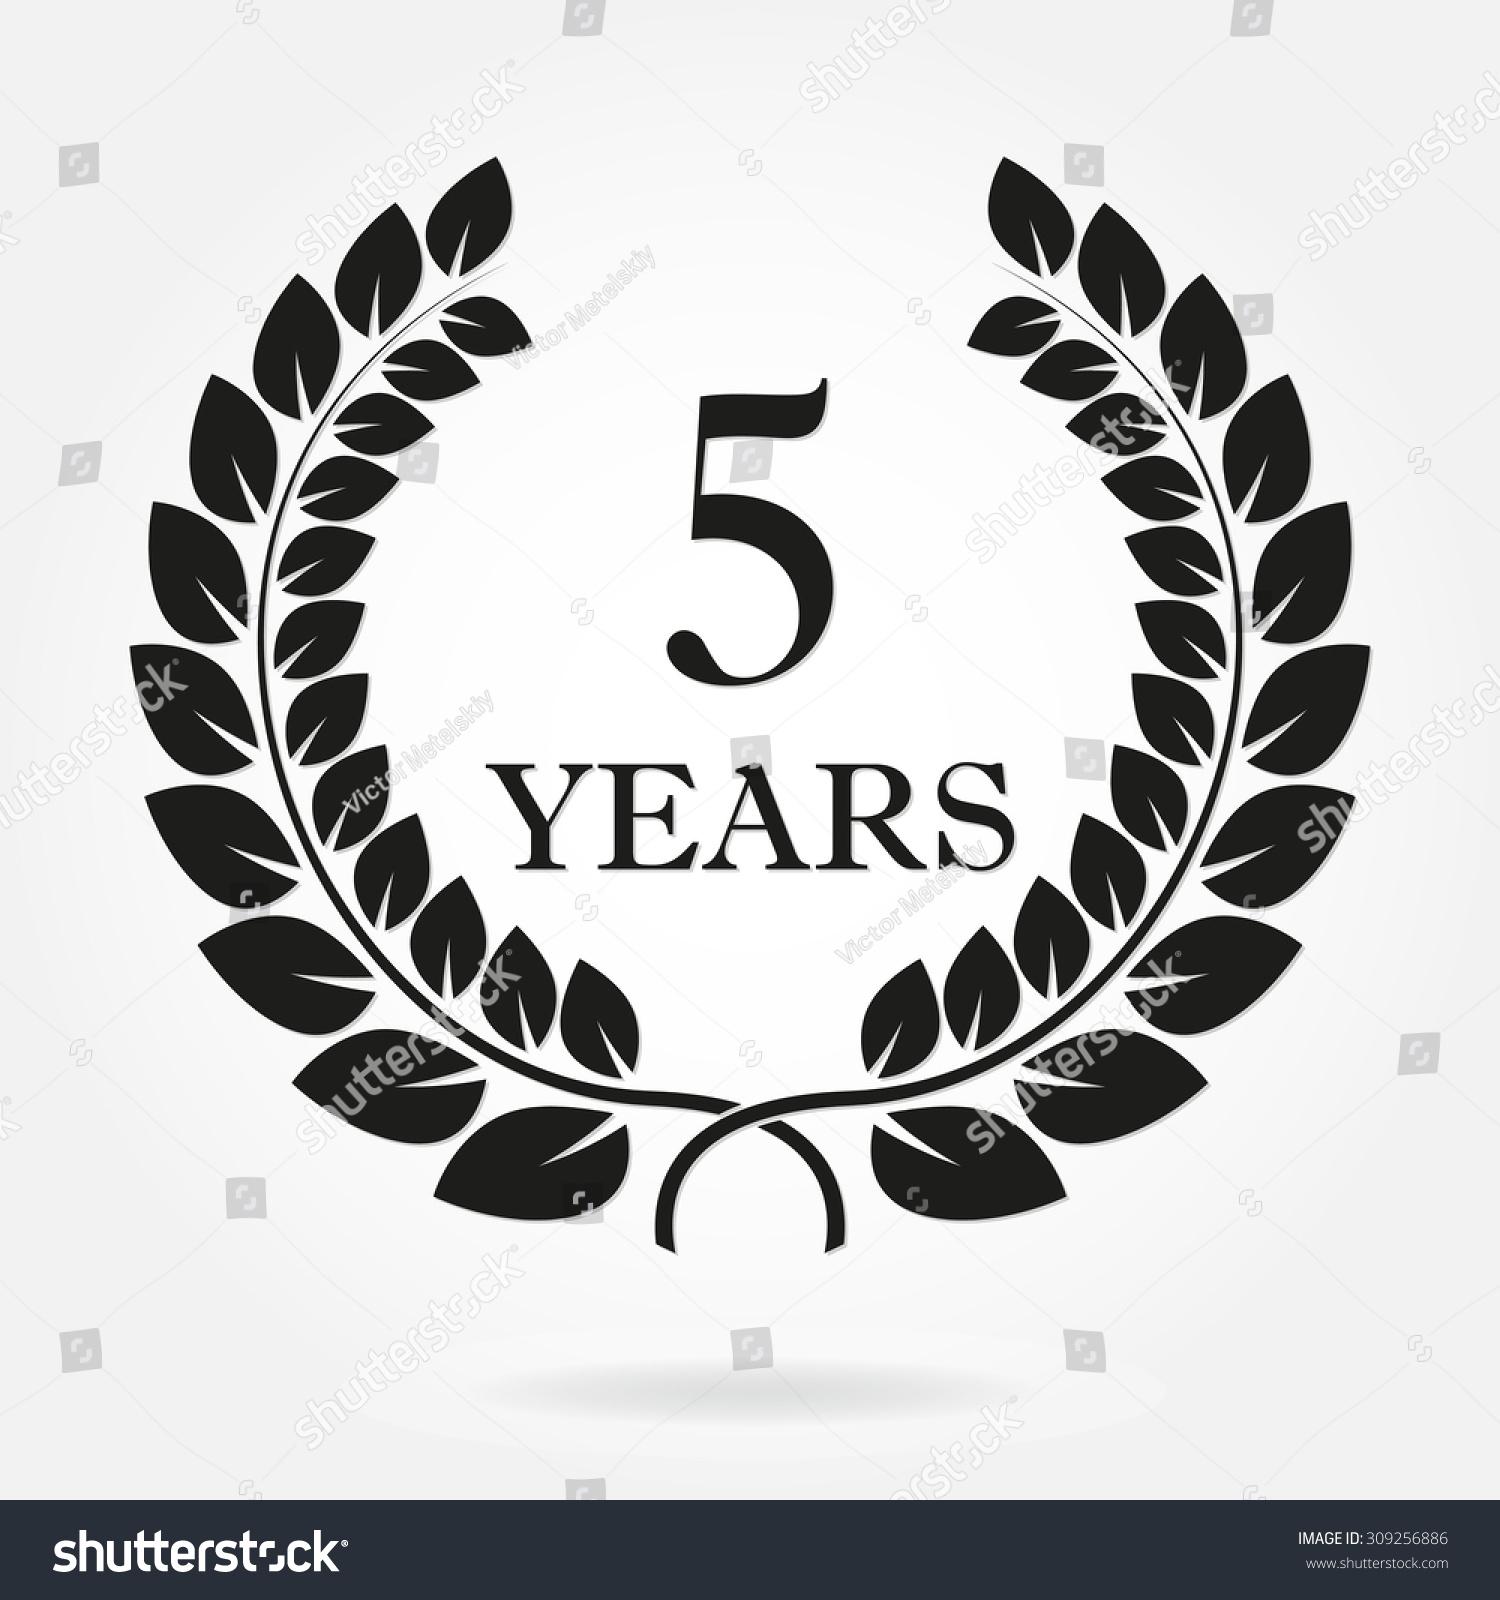 5 Years Anniversary Laurel Wreath Sign Stock Vector ...